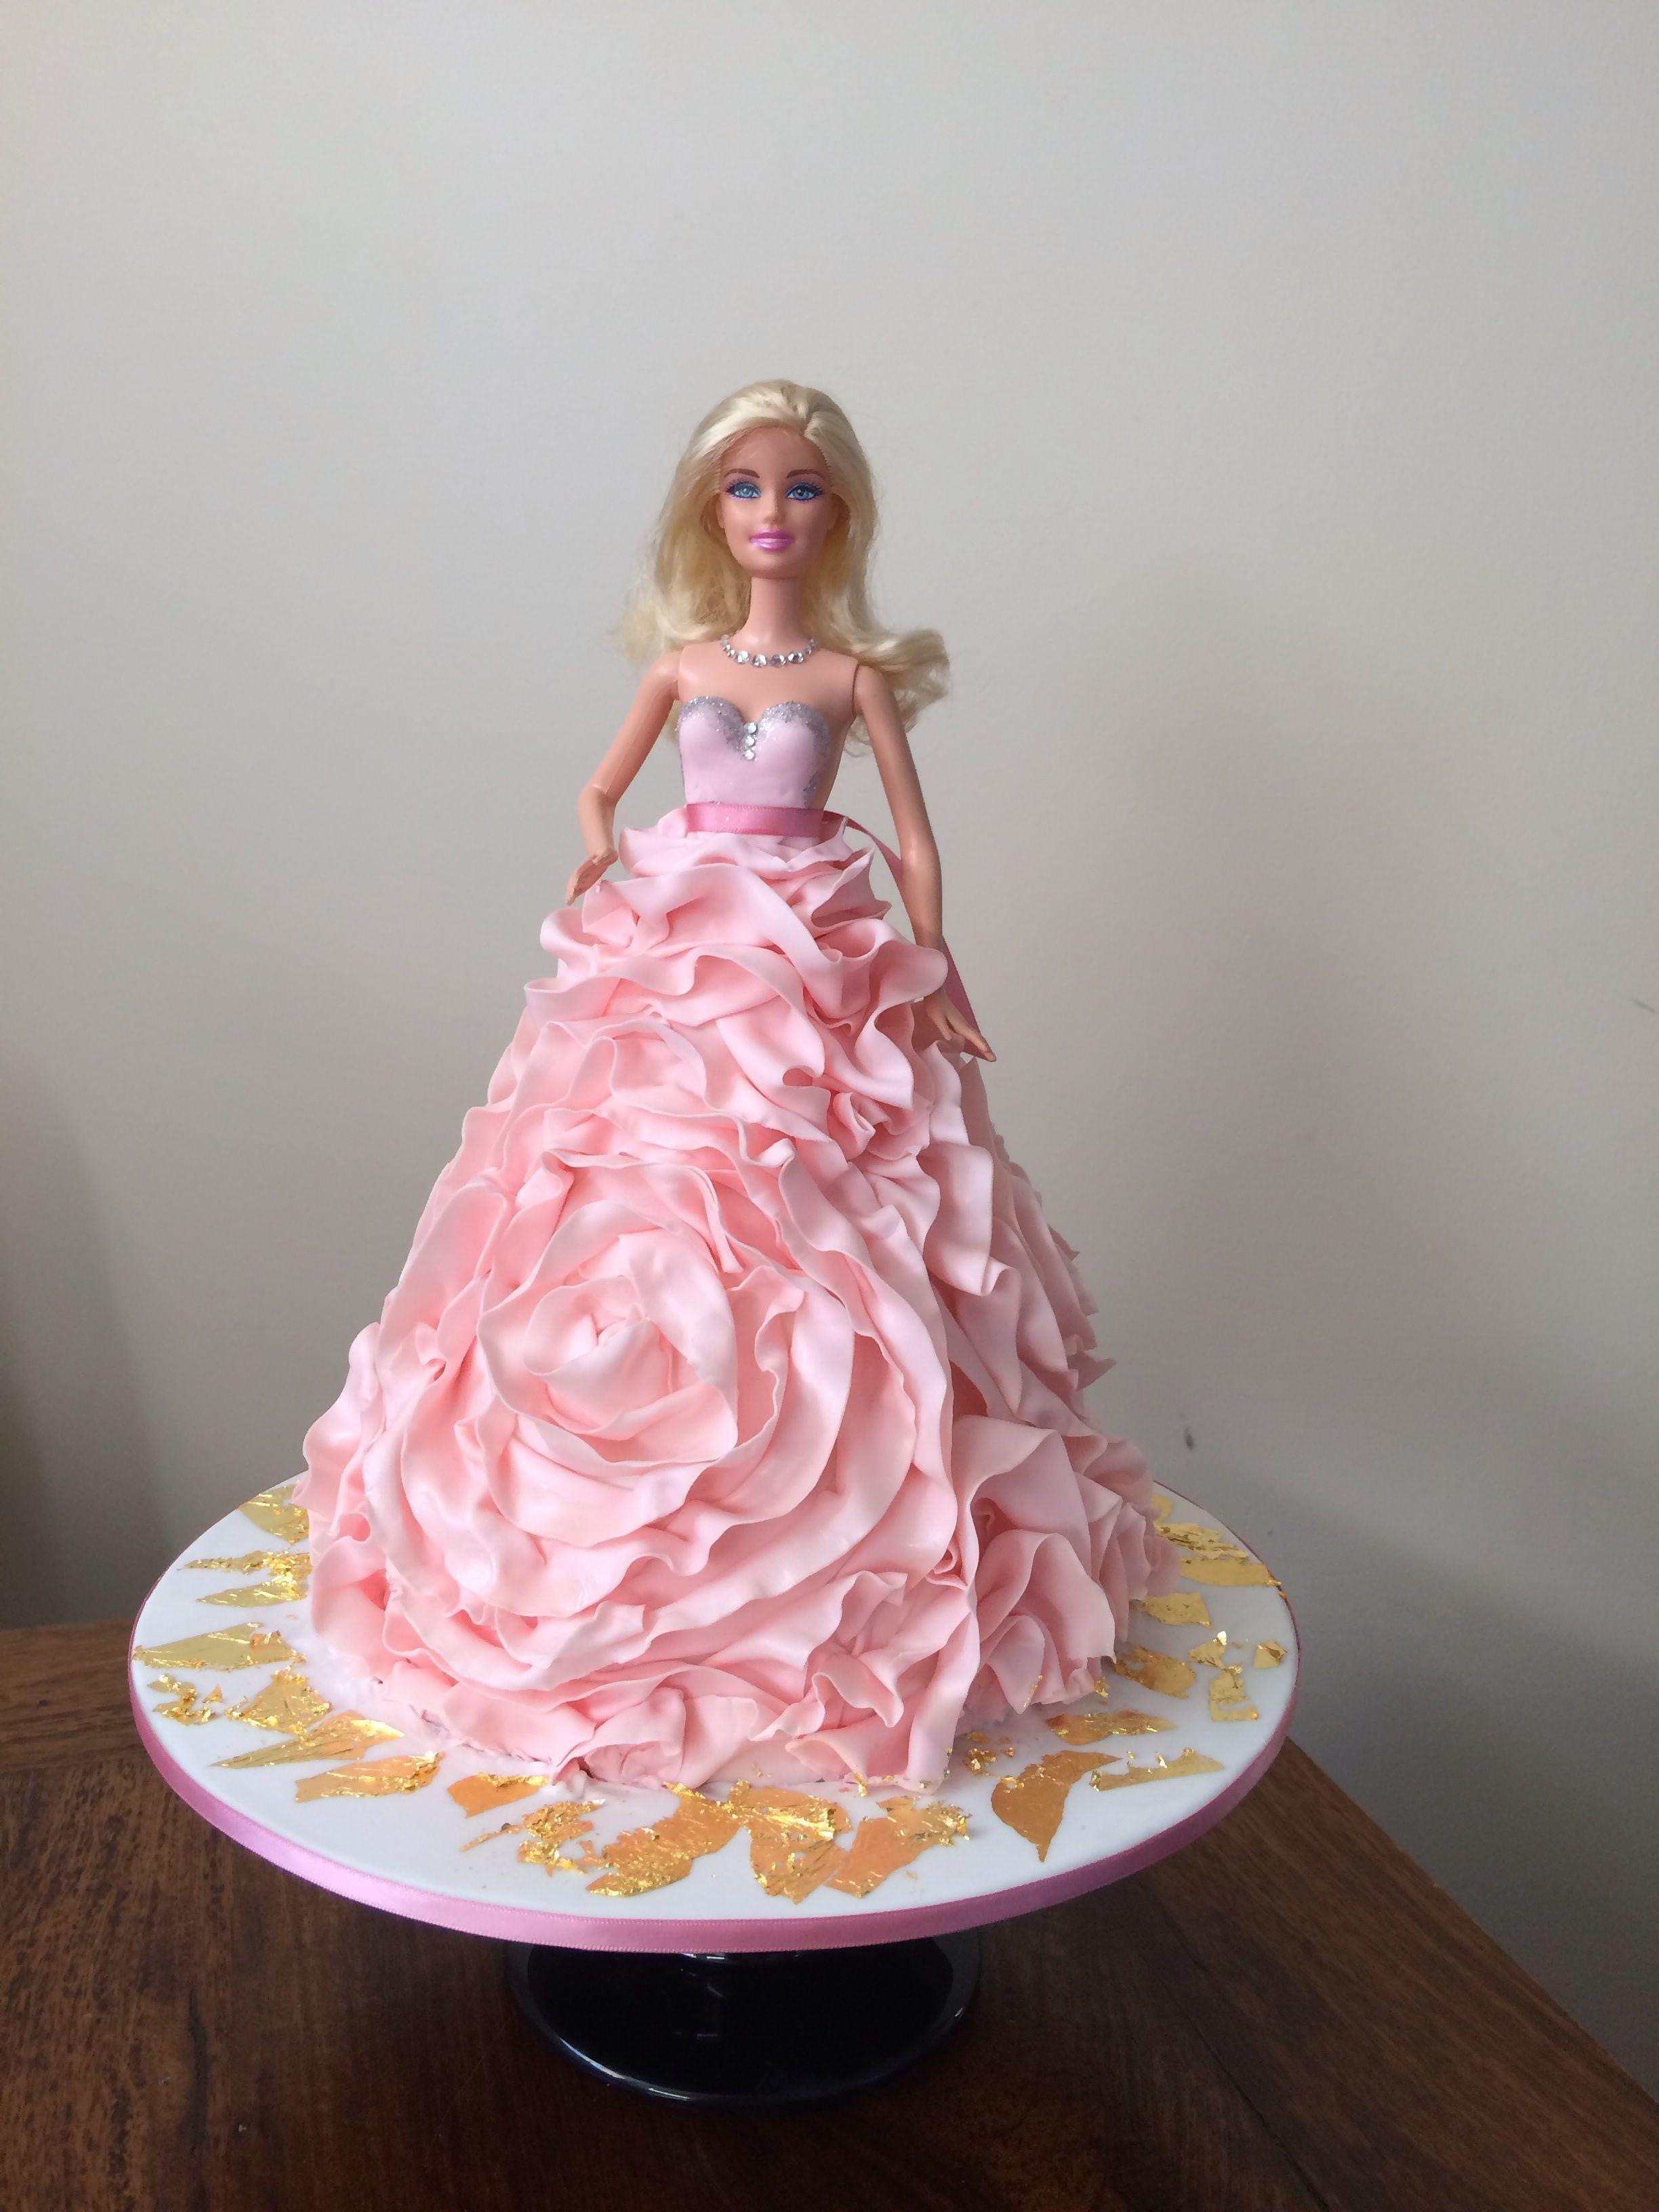 Barbie rose ruffle dress cake | Cakes of all | Pinterest